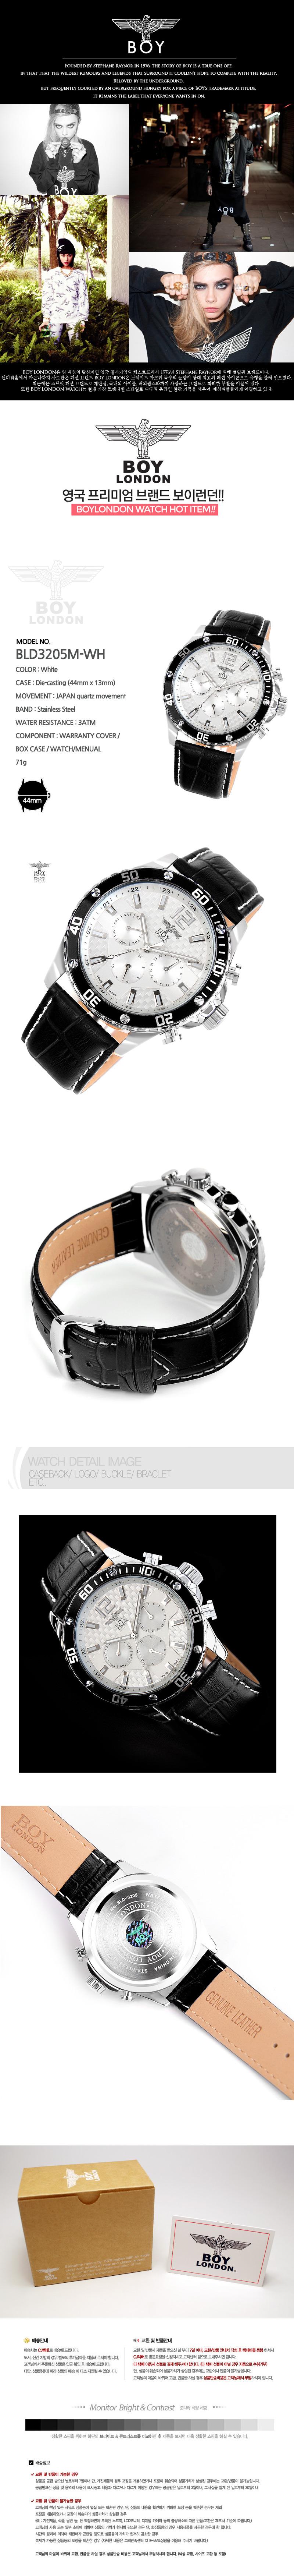 [ BOYLONDON ] BOYLONDON 皮革手表尖晶石刀片3205M-WH